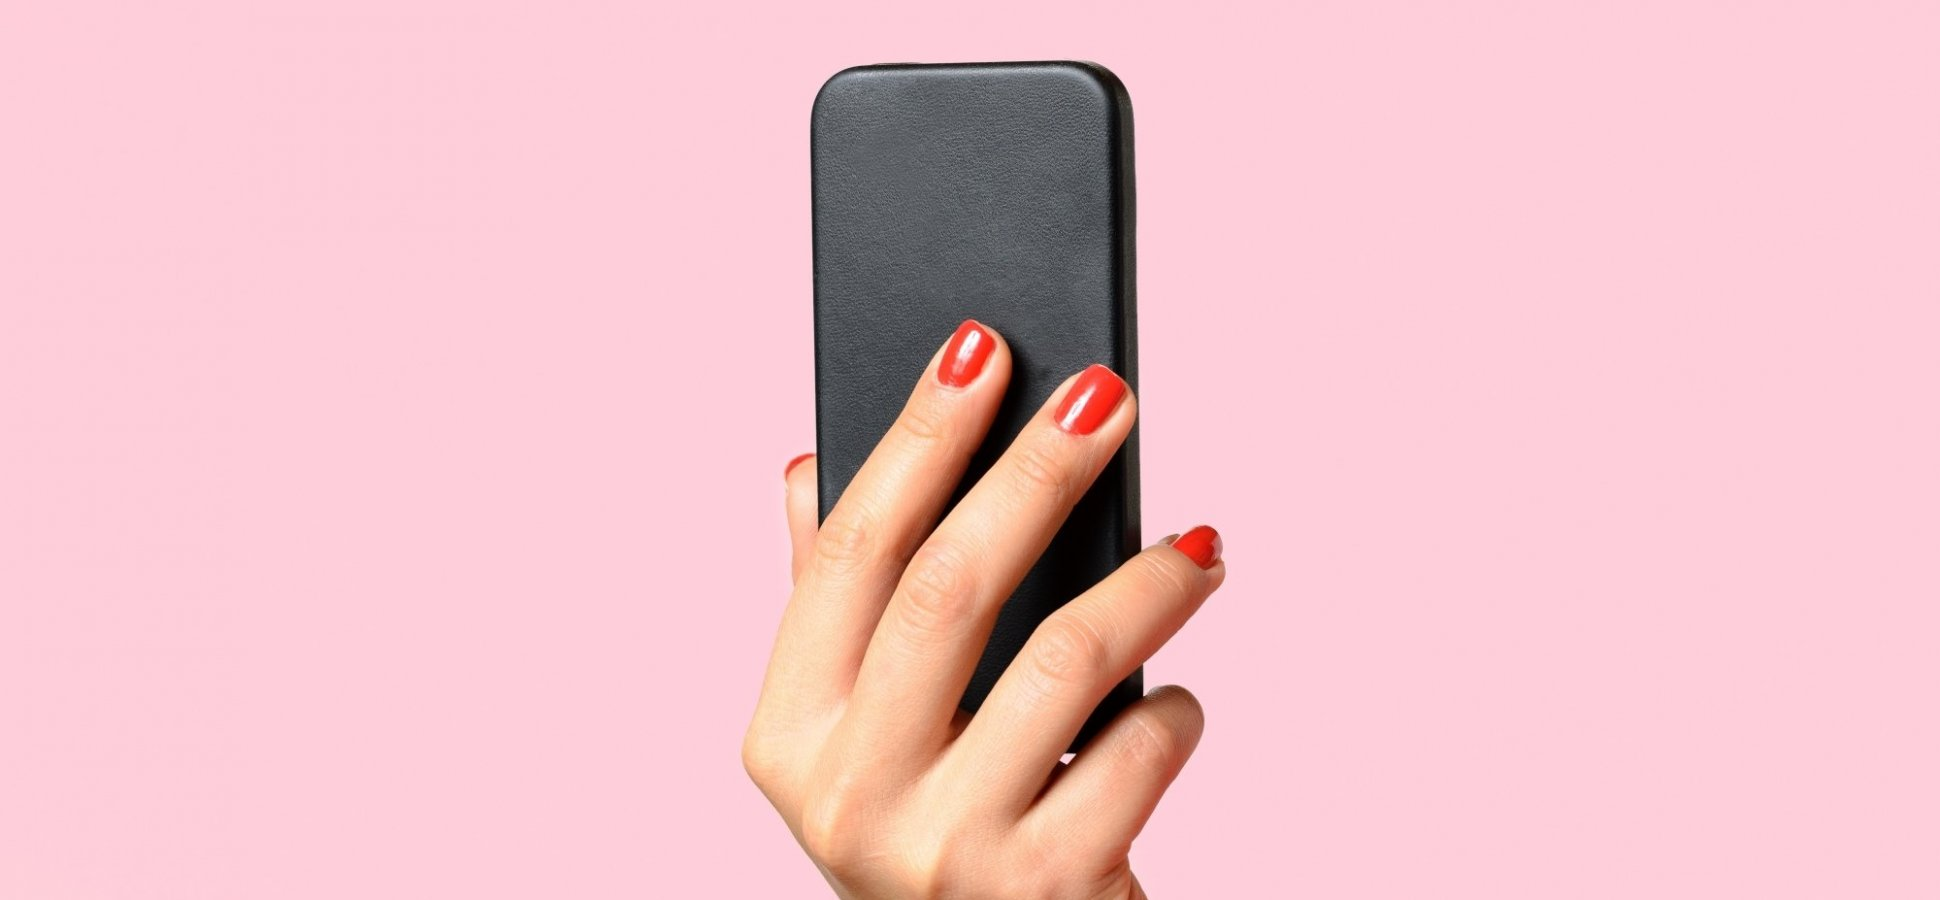 6 ways break your iphone addiction